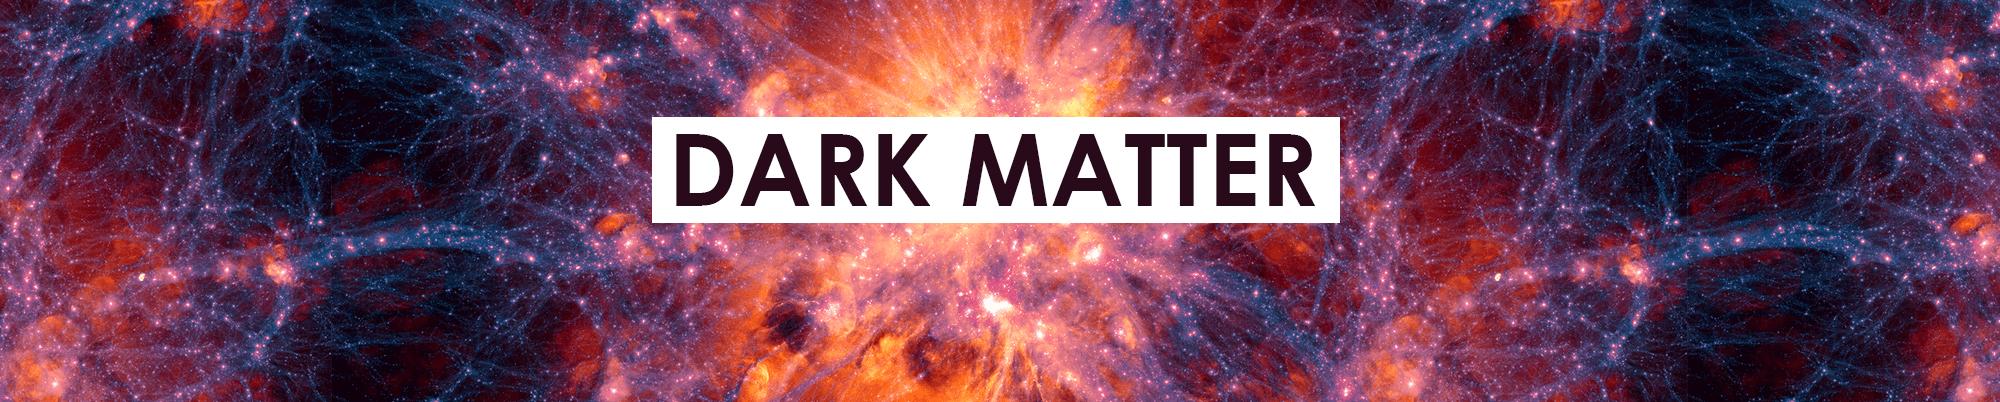 https://www.study24x7.com/article/563/what-is-dark-ma...